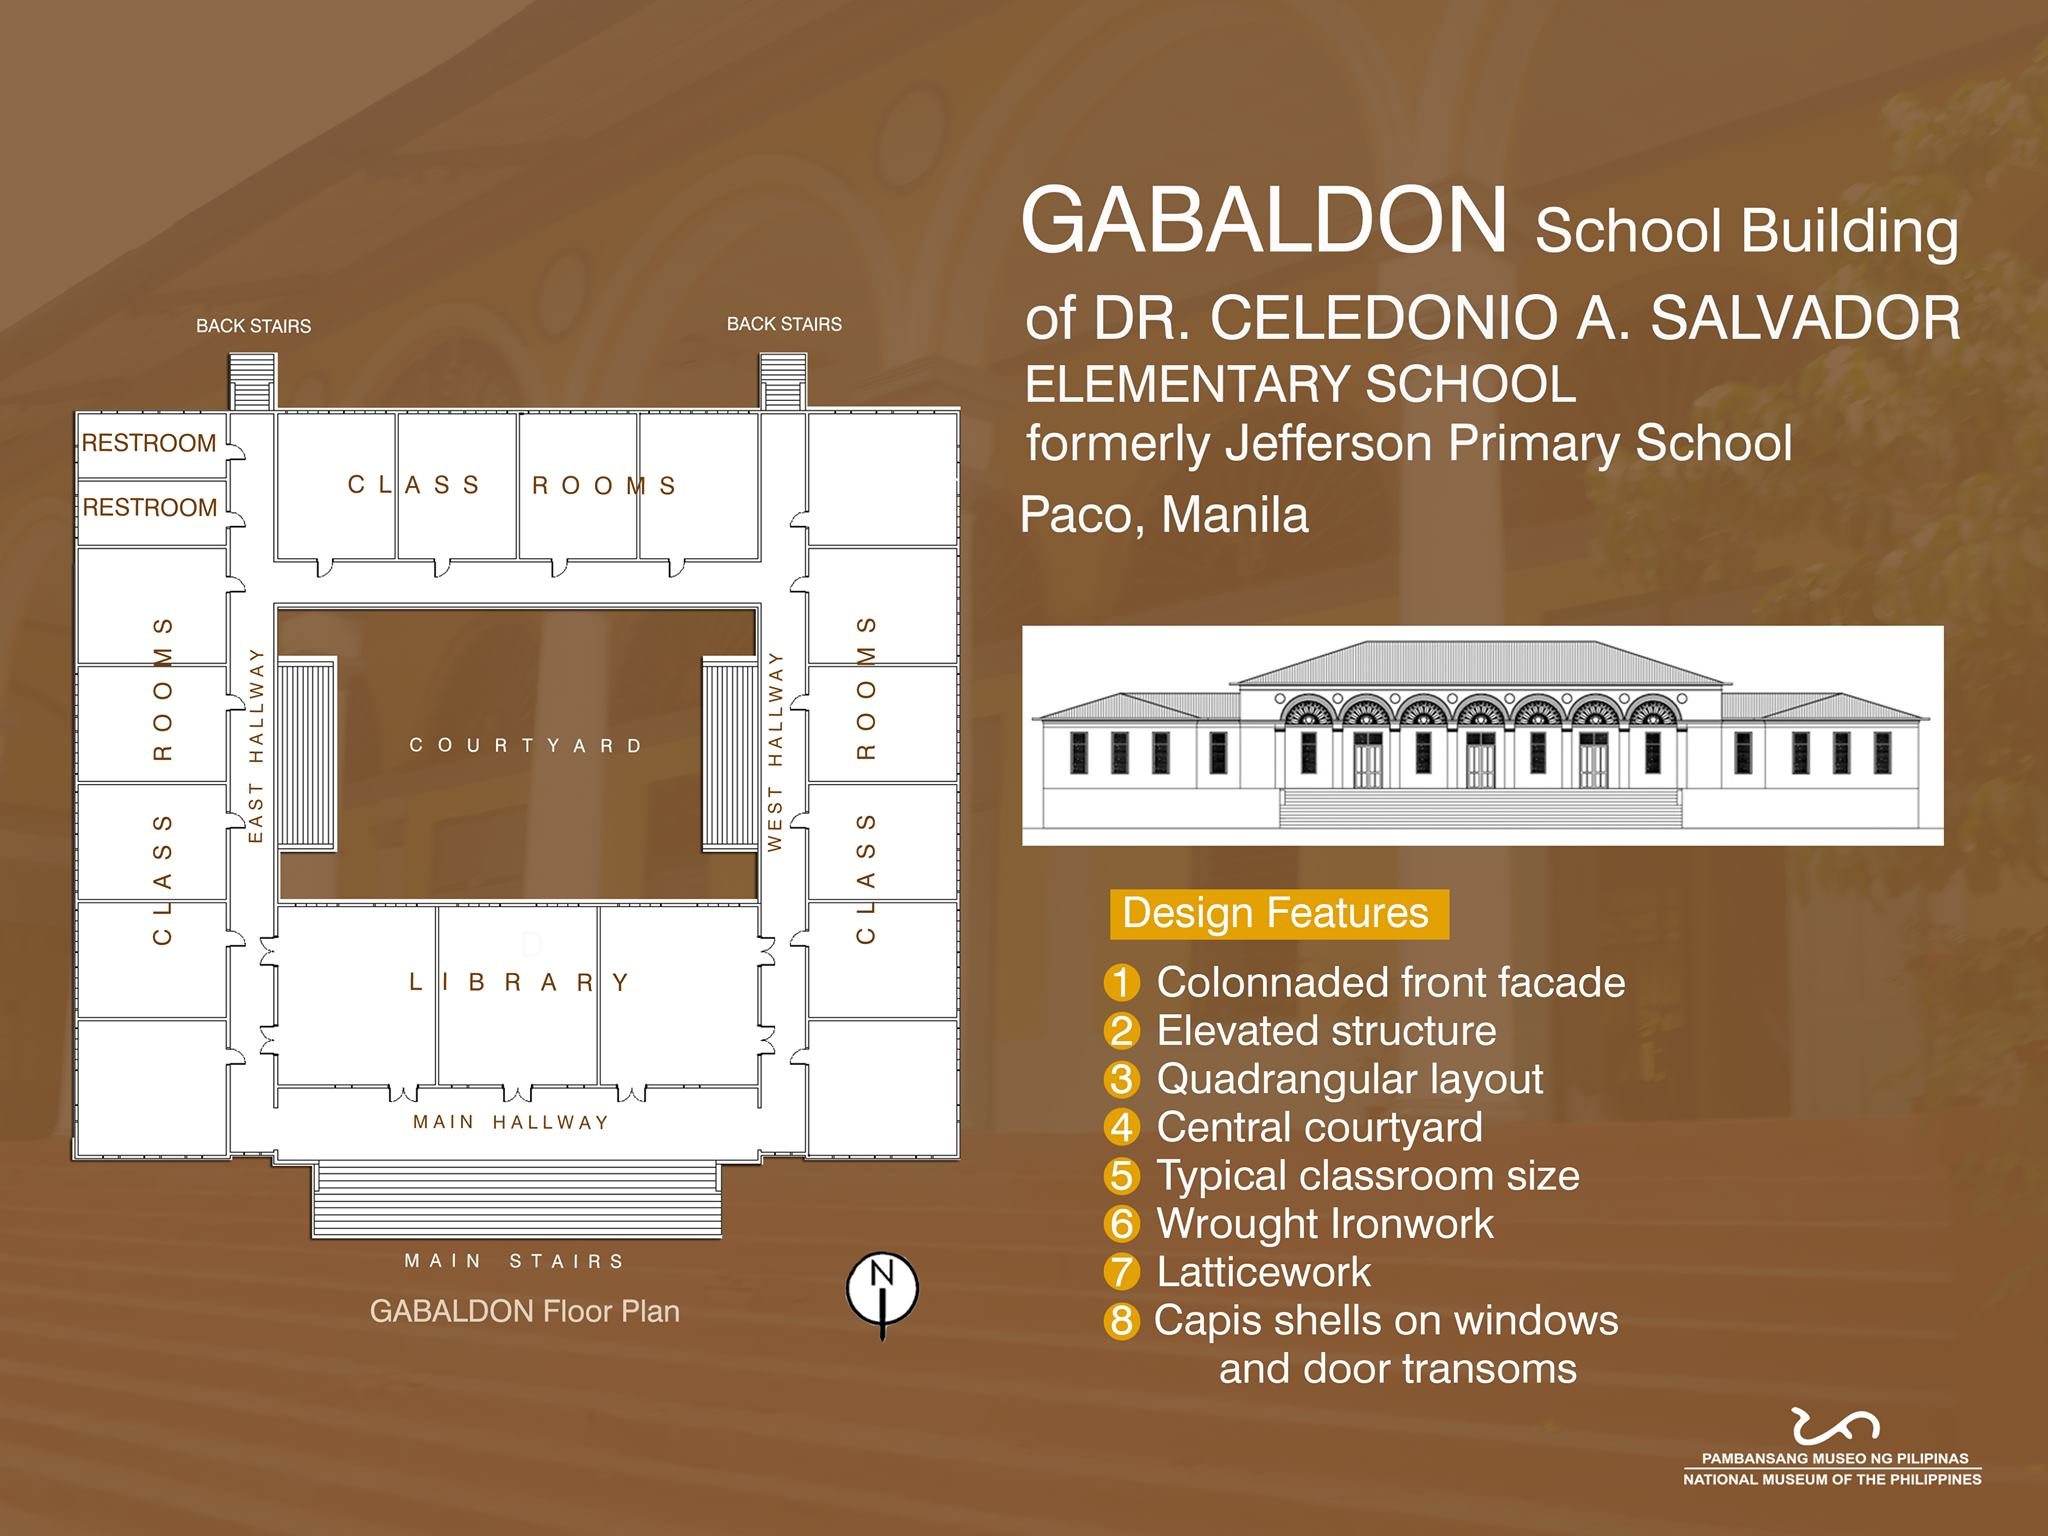 Gabaldon school building of Dr. Celedonio A. Salvador Elementary School